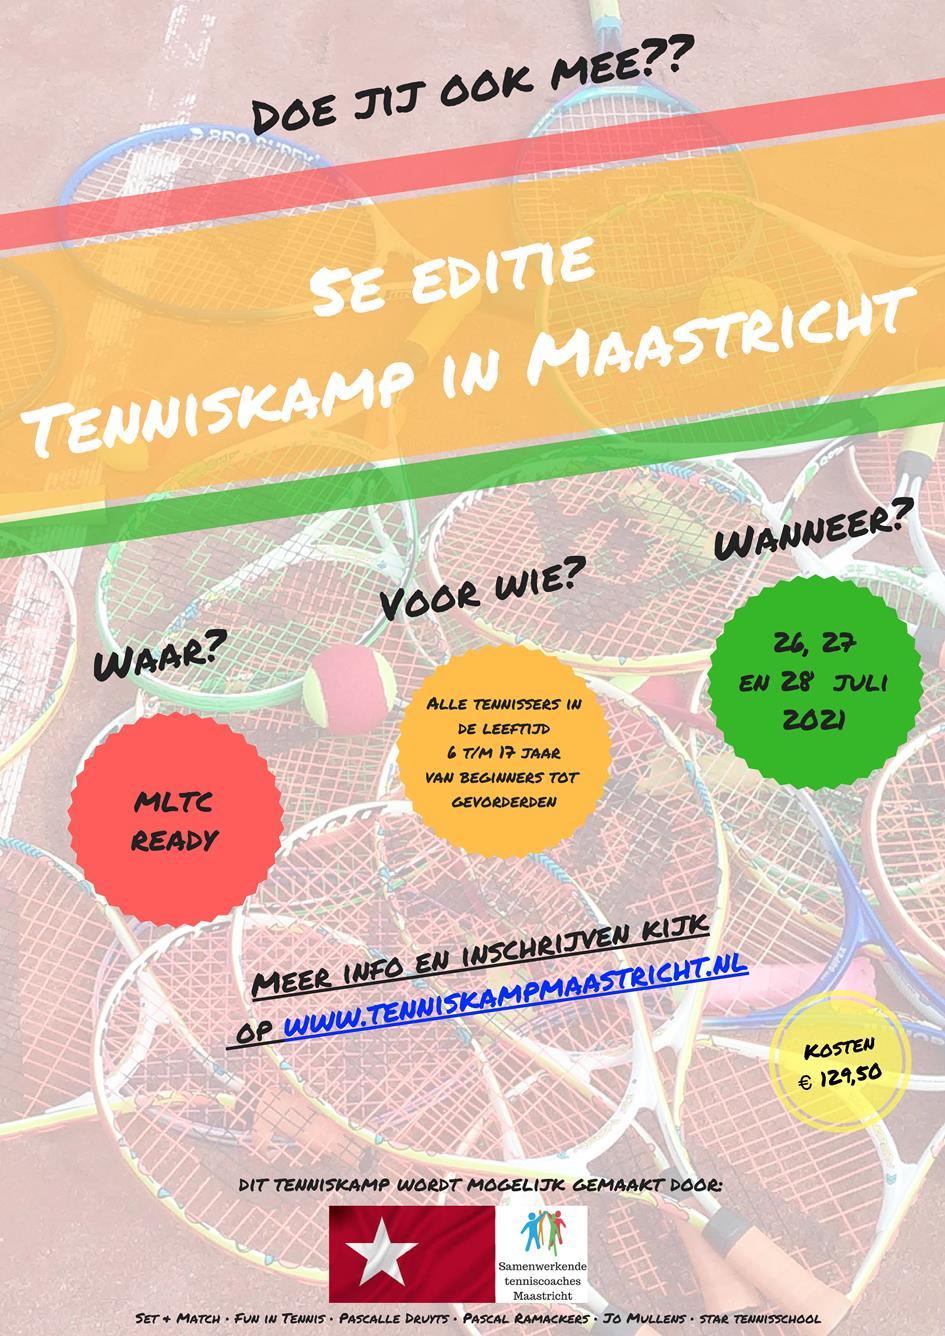 Tenniskamp Maastricht-page-001.jpg